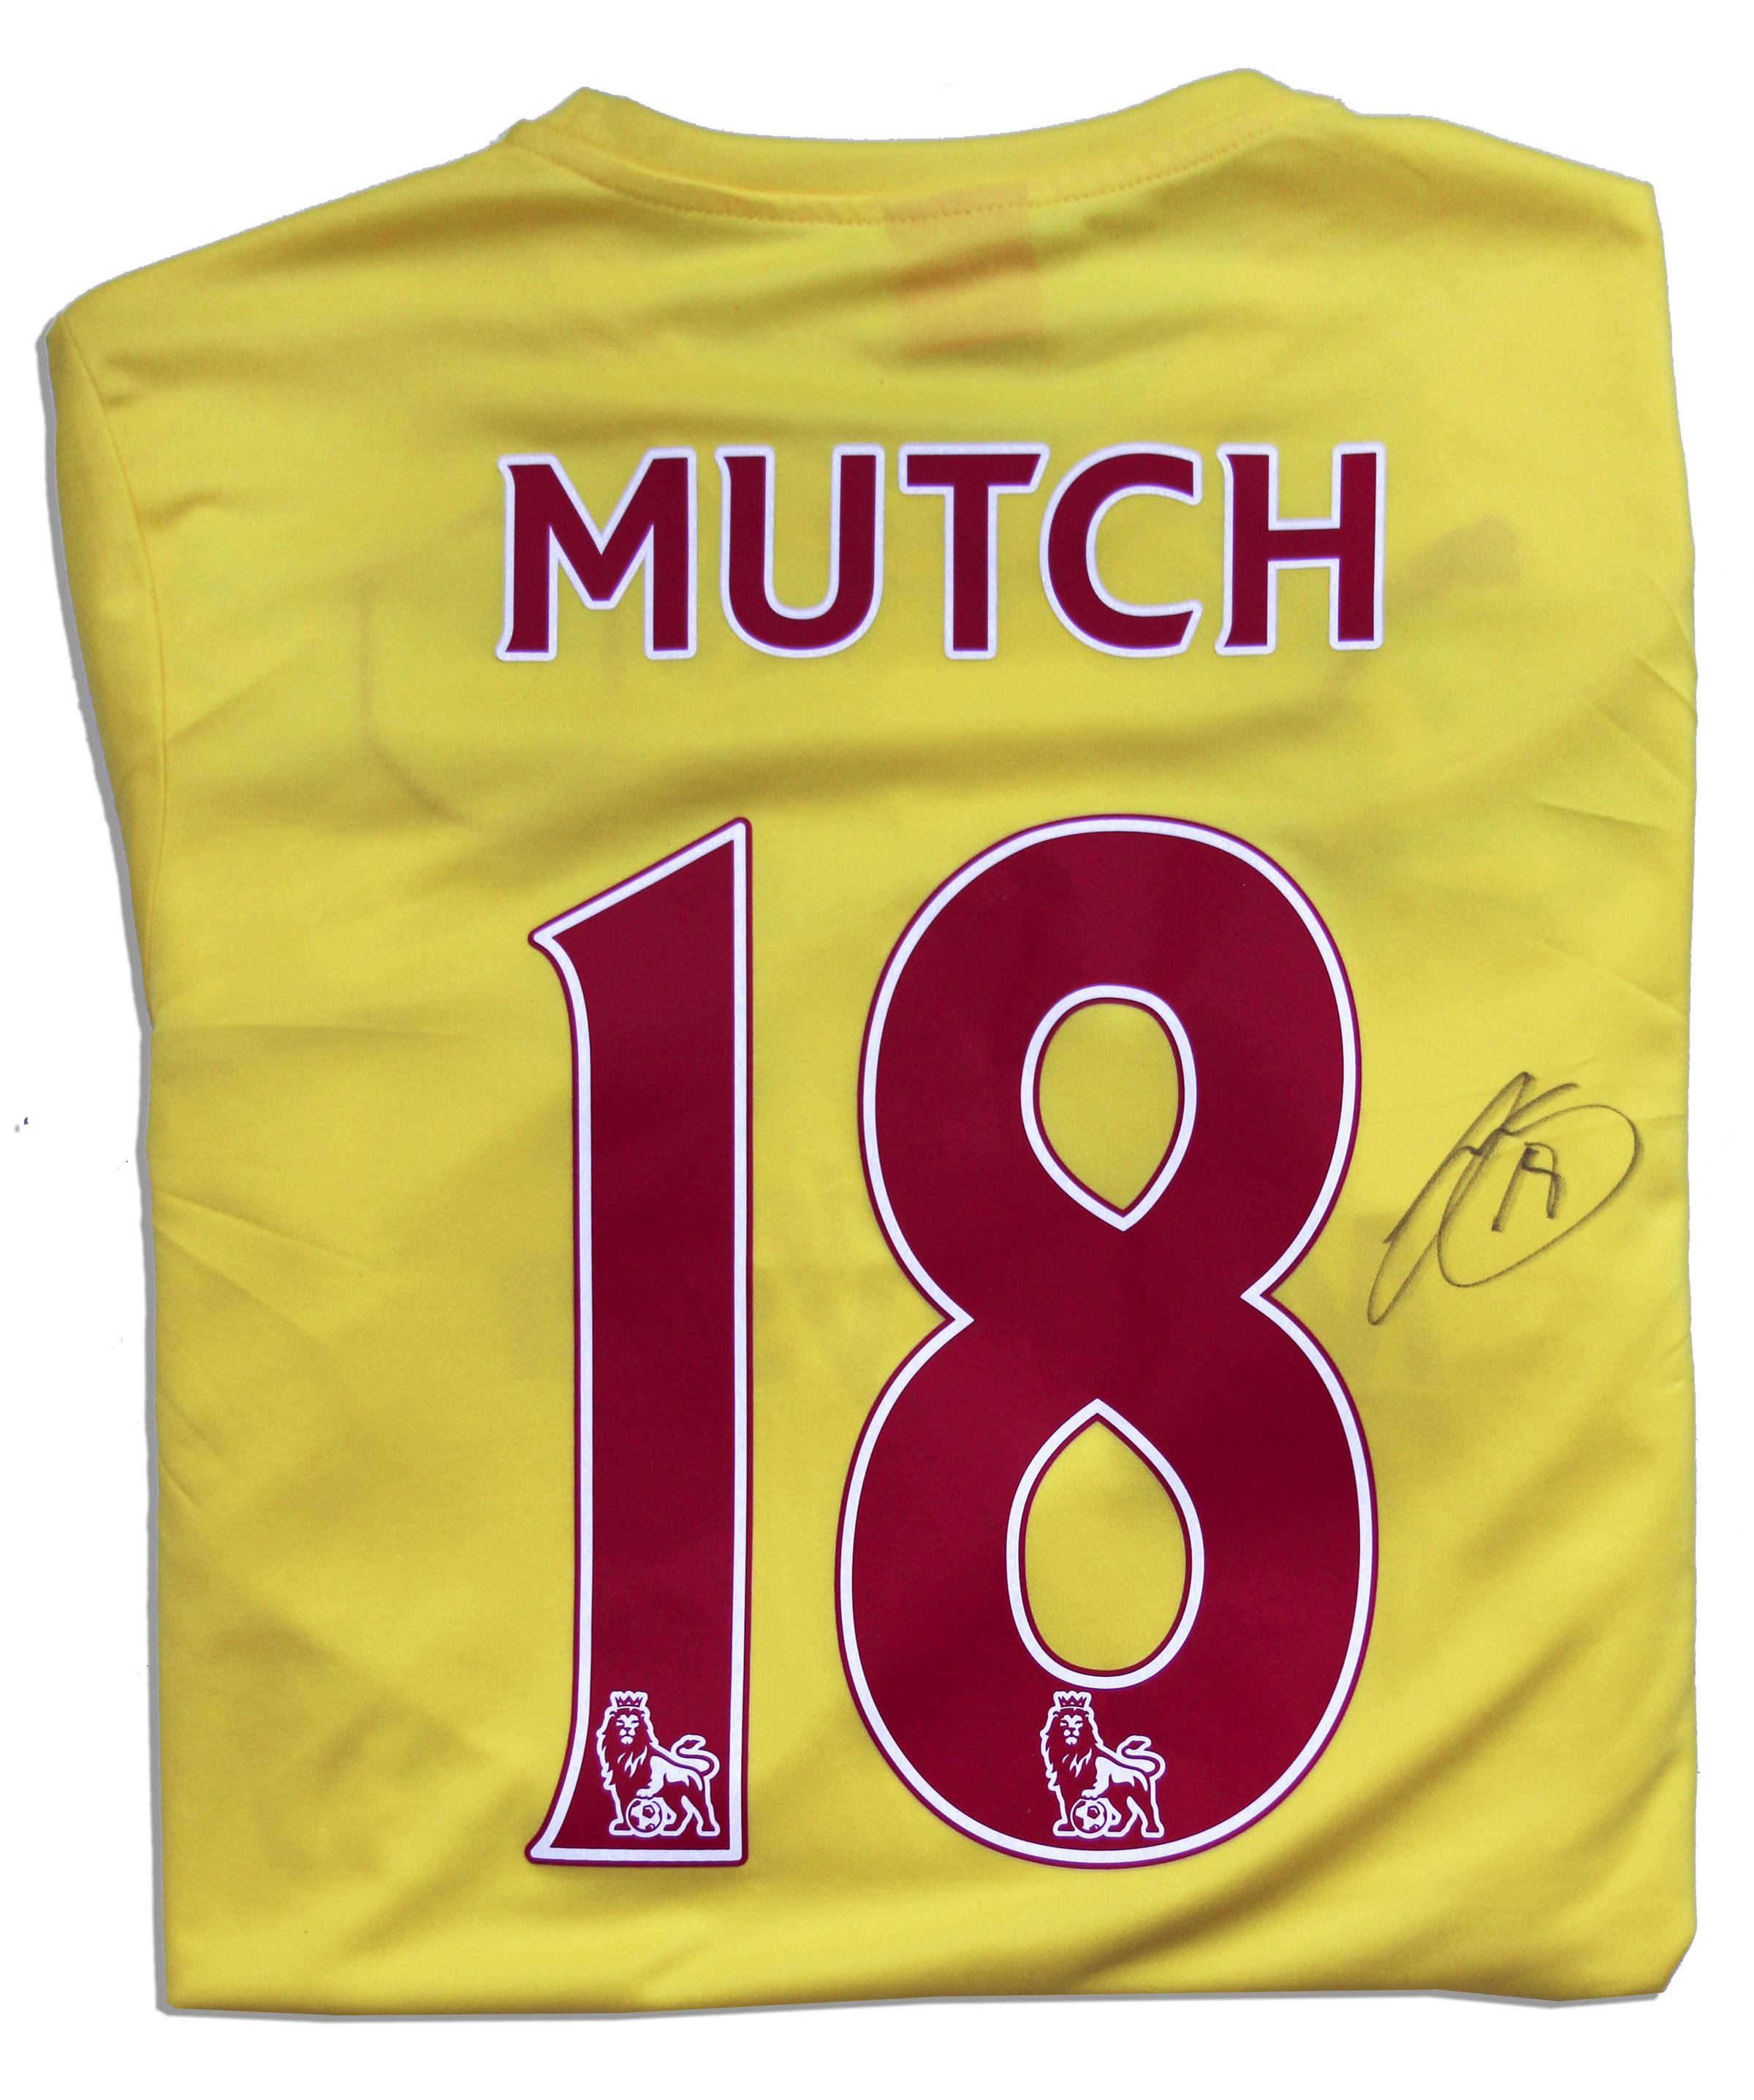 Lot Detail - Jordon Mutch Match Worn Cardiff City Football Shirt Signed dd8c2879e